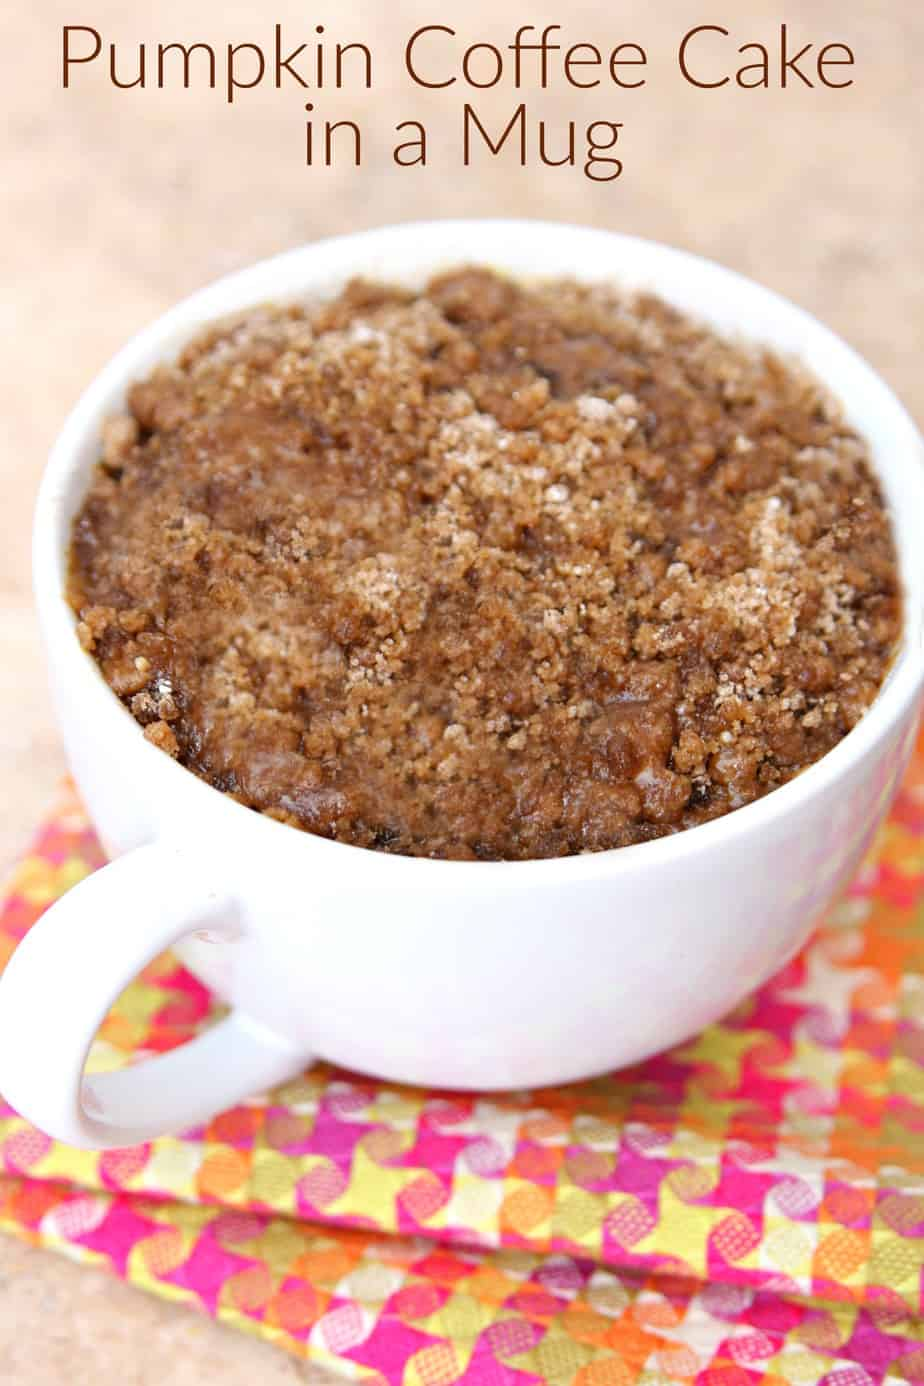 Pumpkin Coffee Cake in a Mug